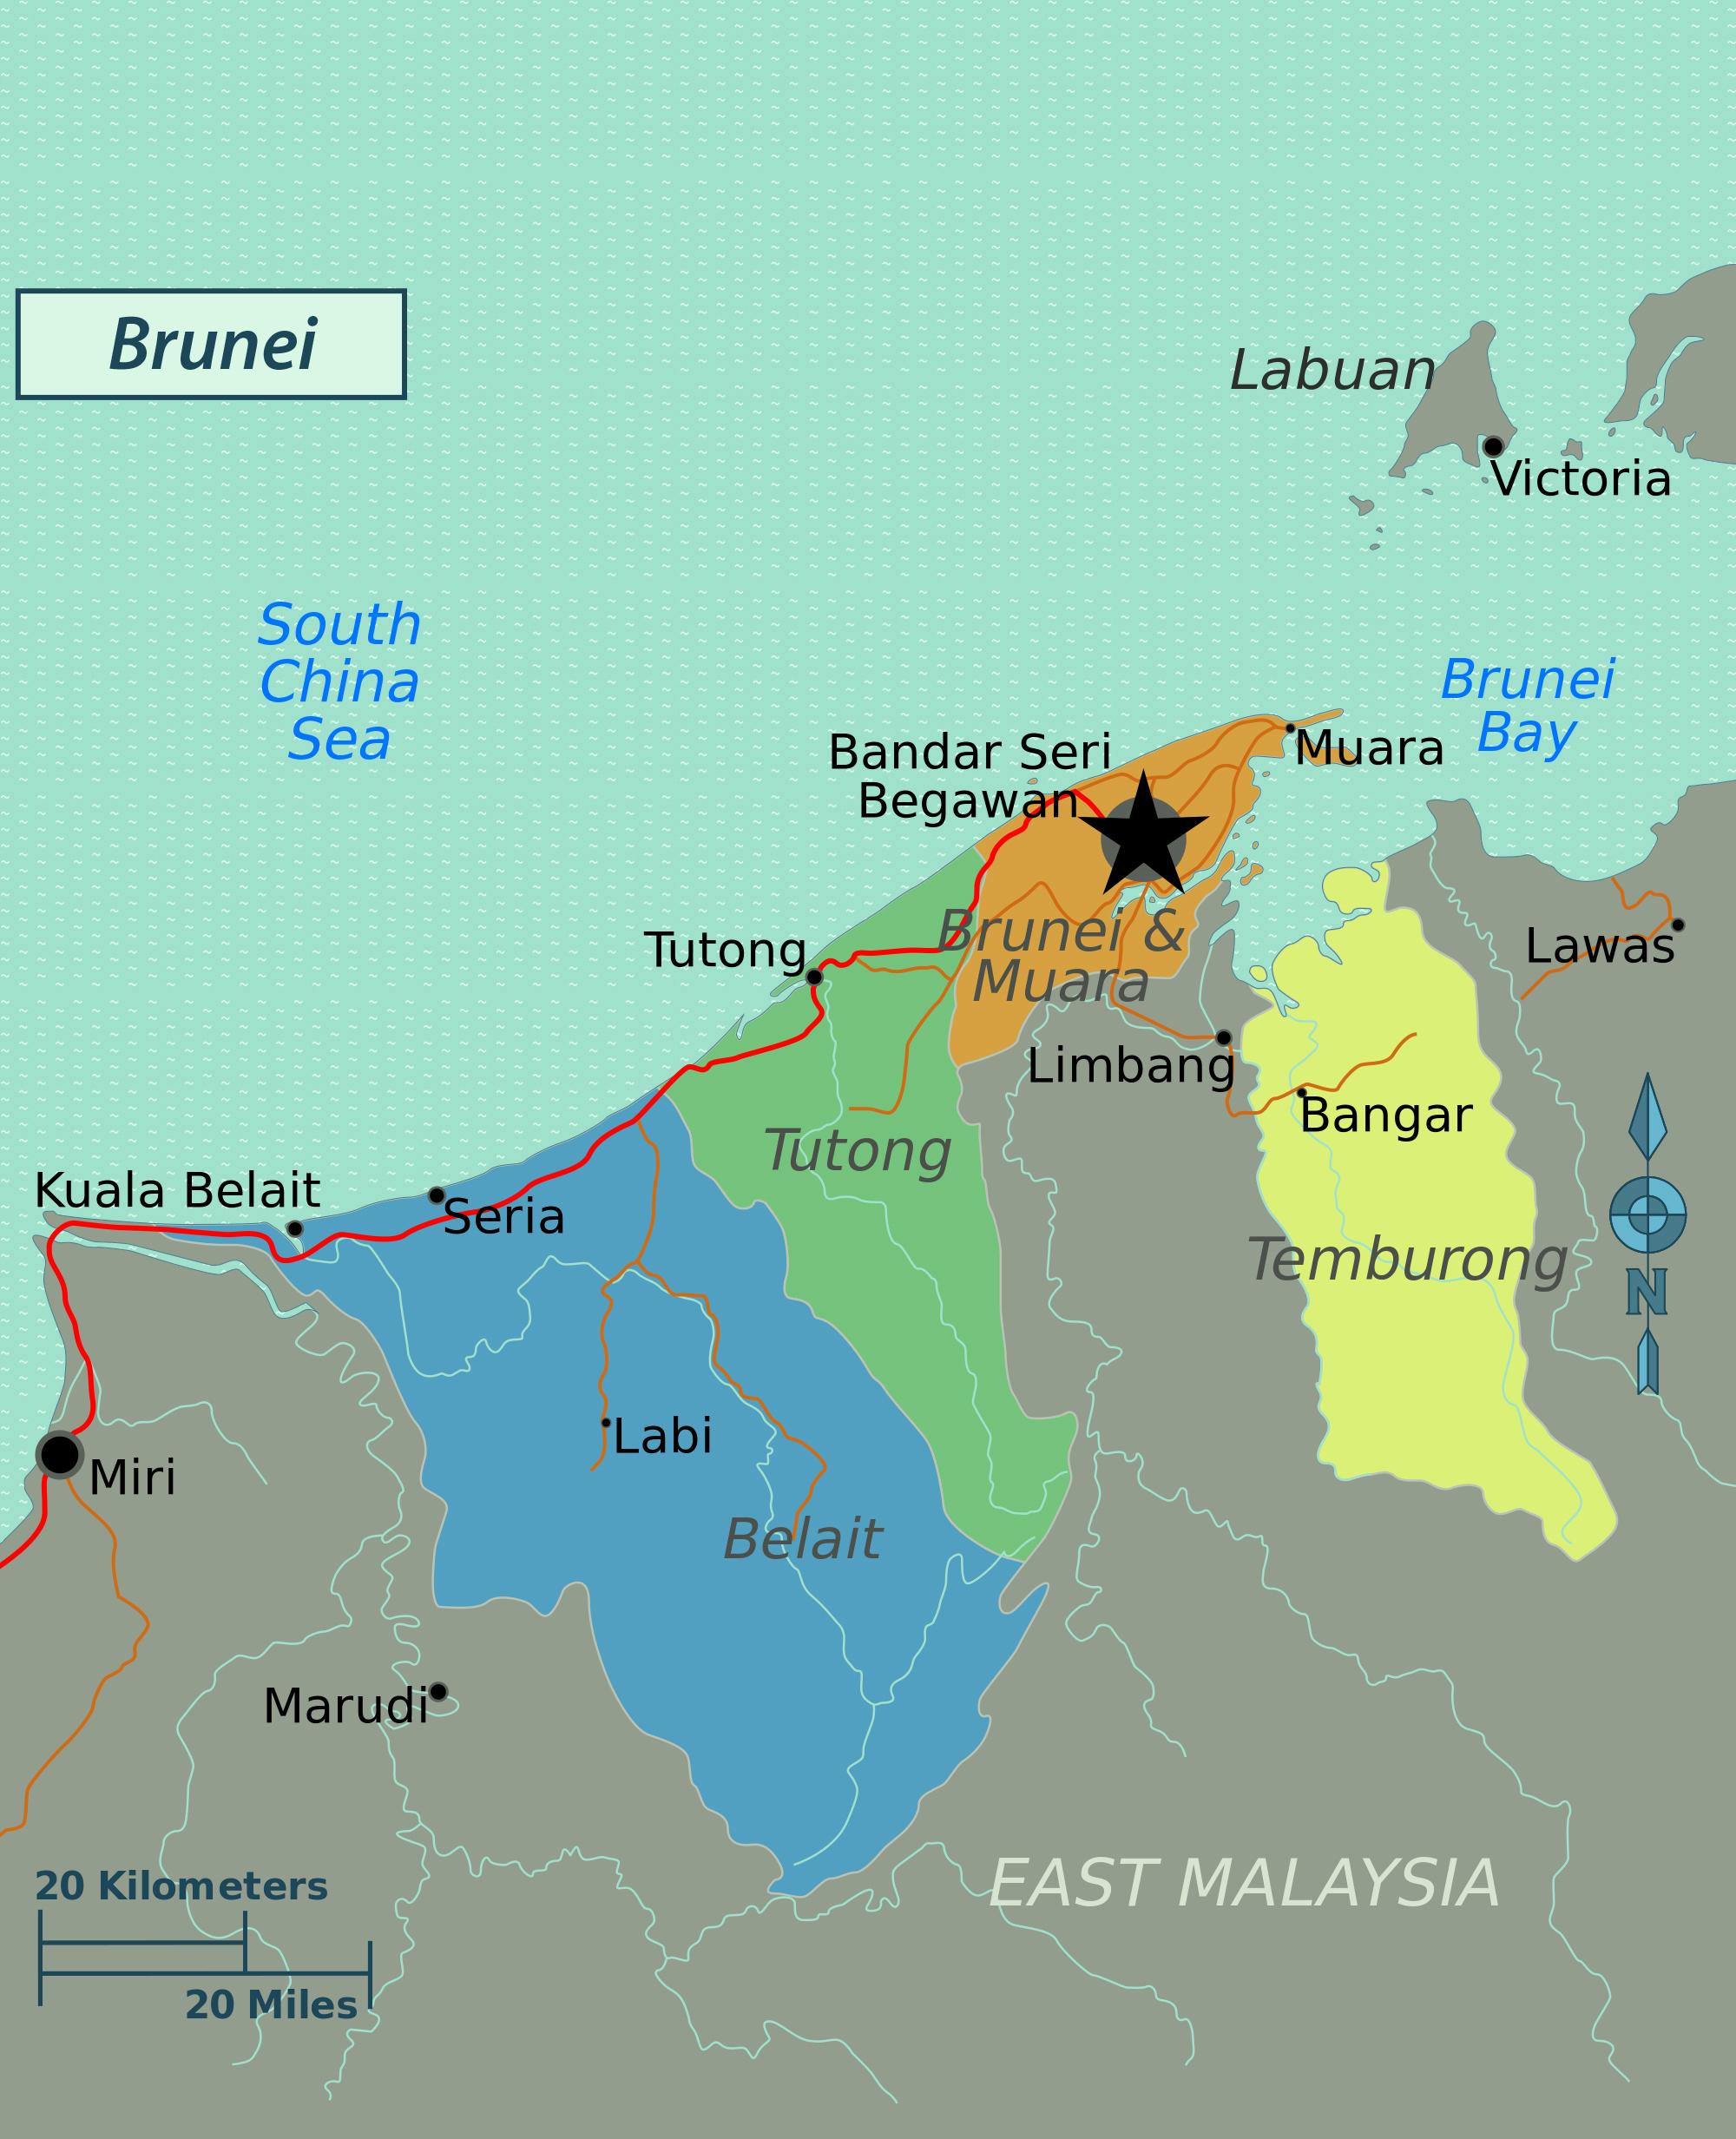 Large regions map of Brunei Brunei Asia Mapsland Maps of